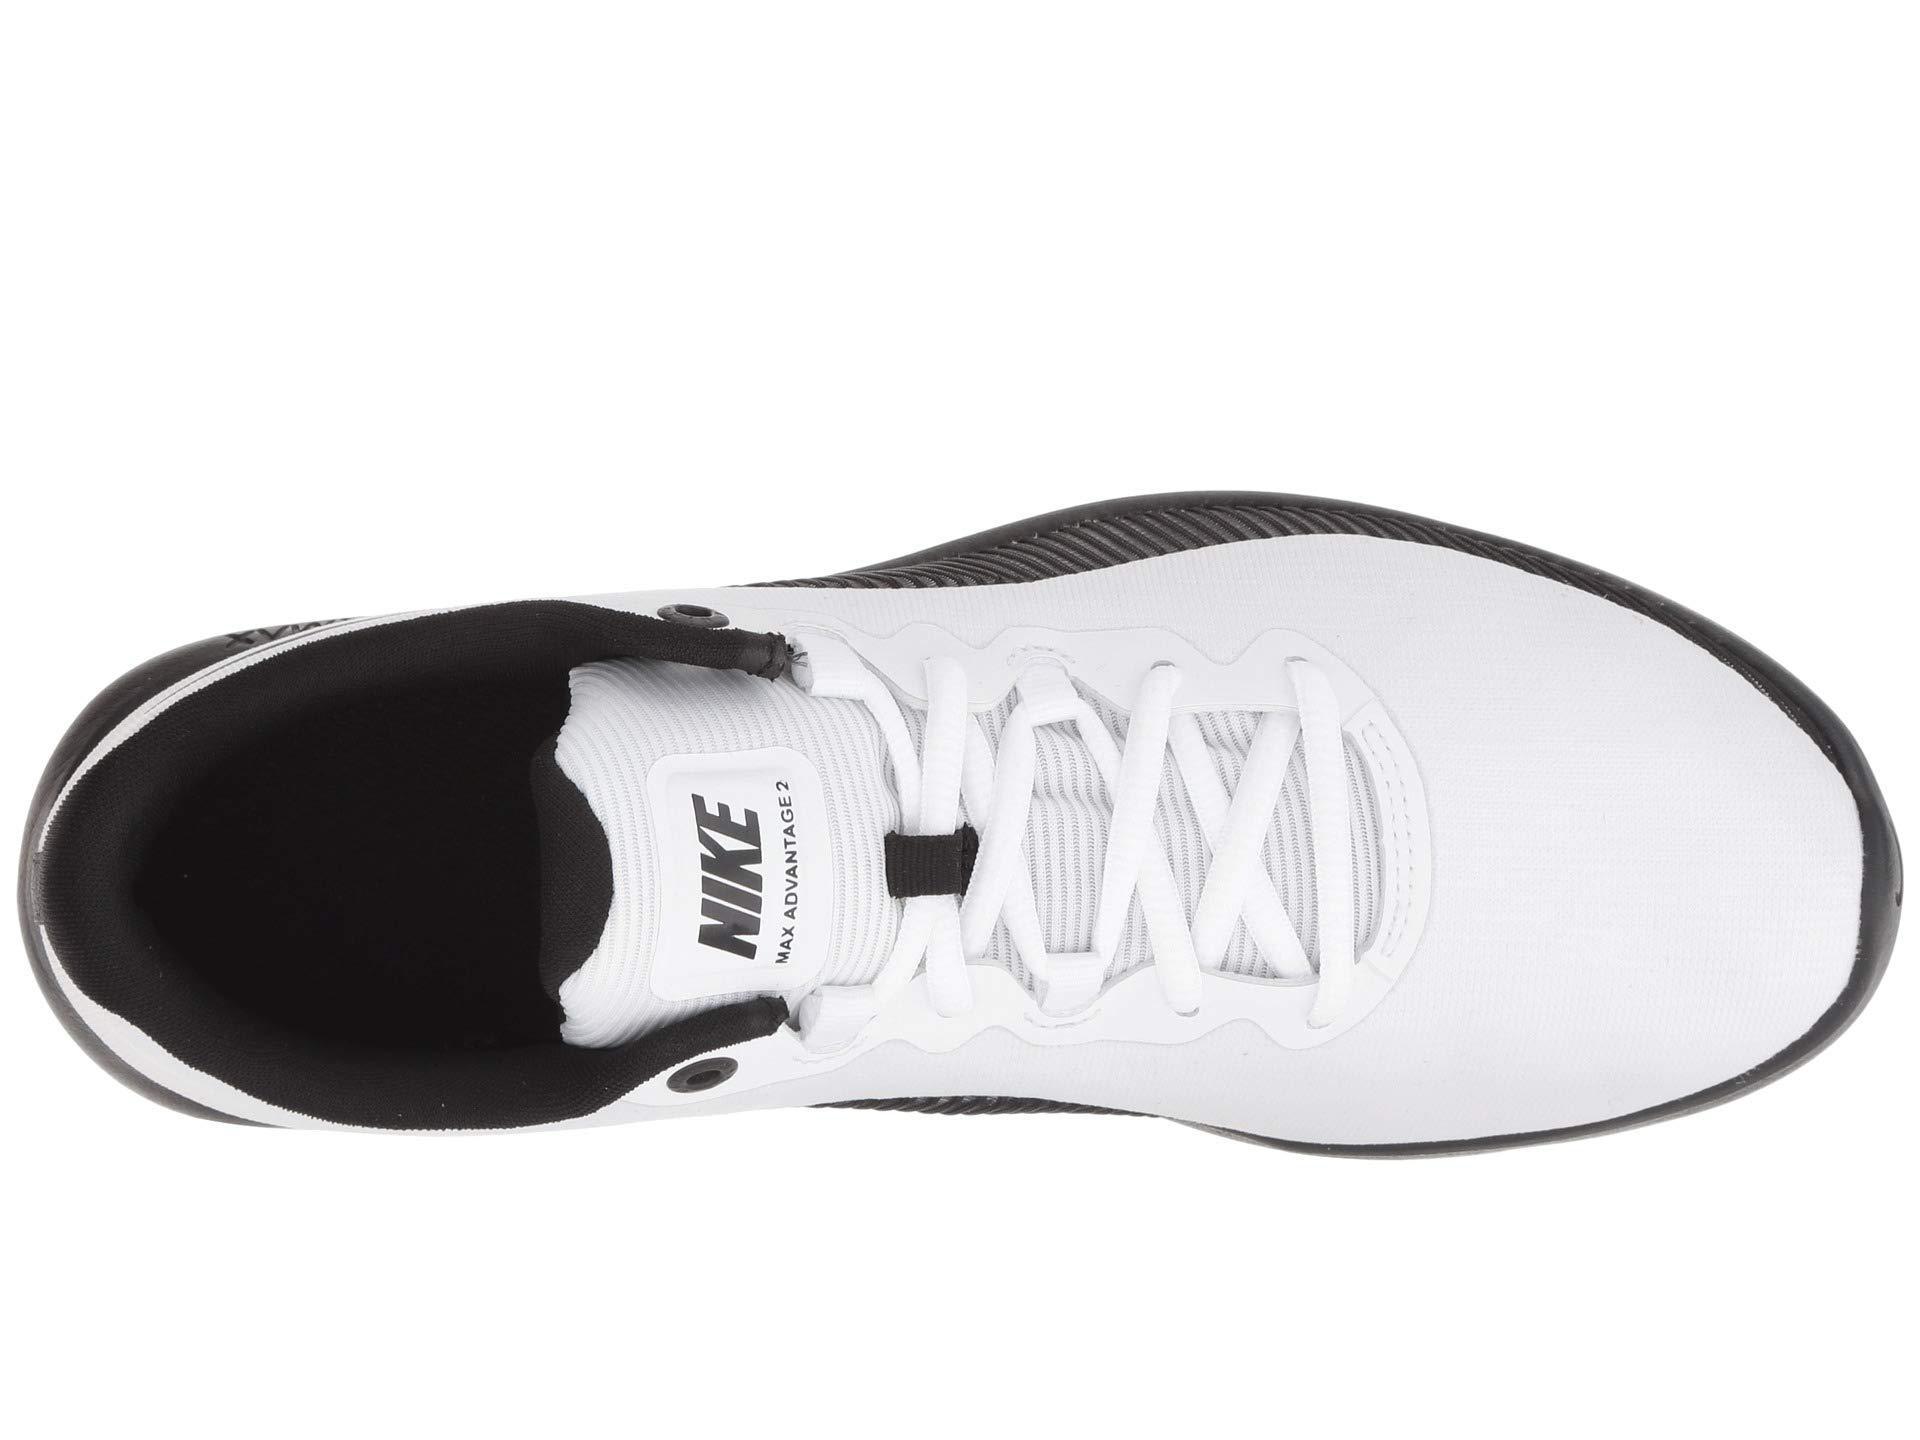 fc4a3f5c398f8 Air 2 Lyst Nike blackmetallic Max Goldobsidian Advantage qx57A